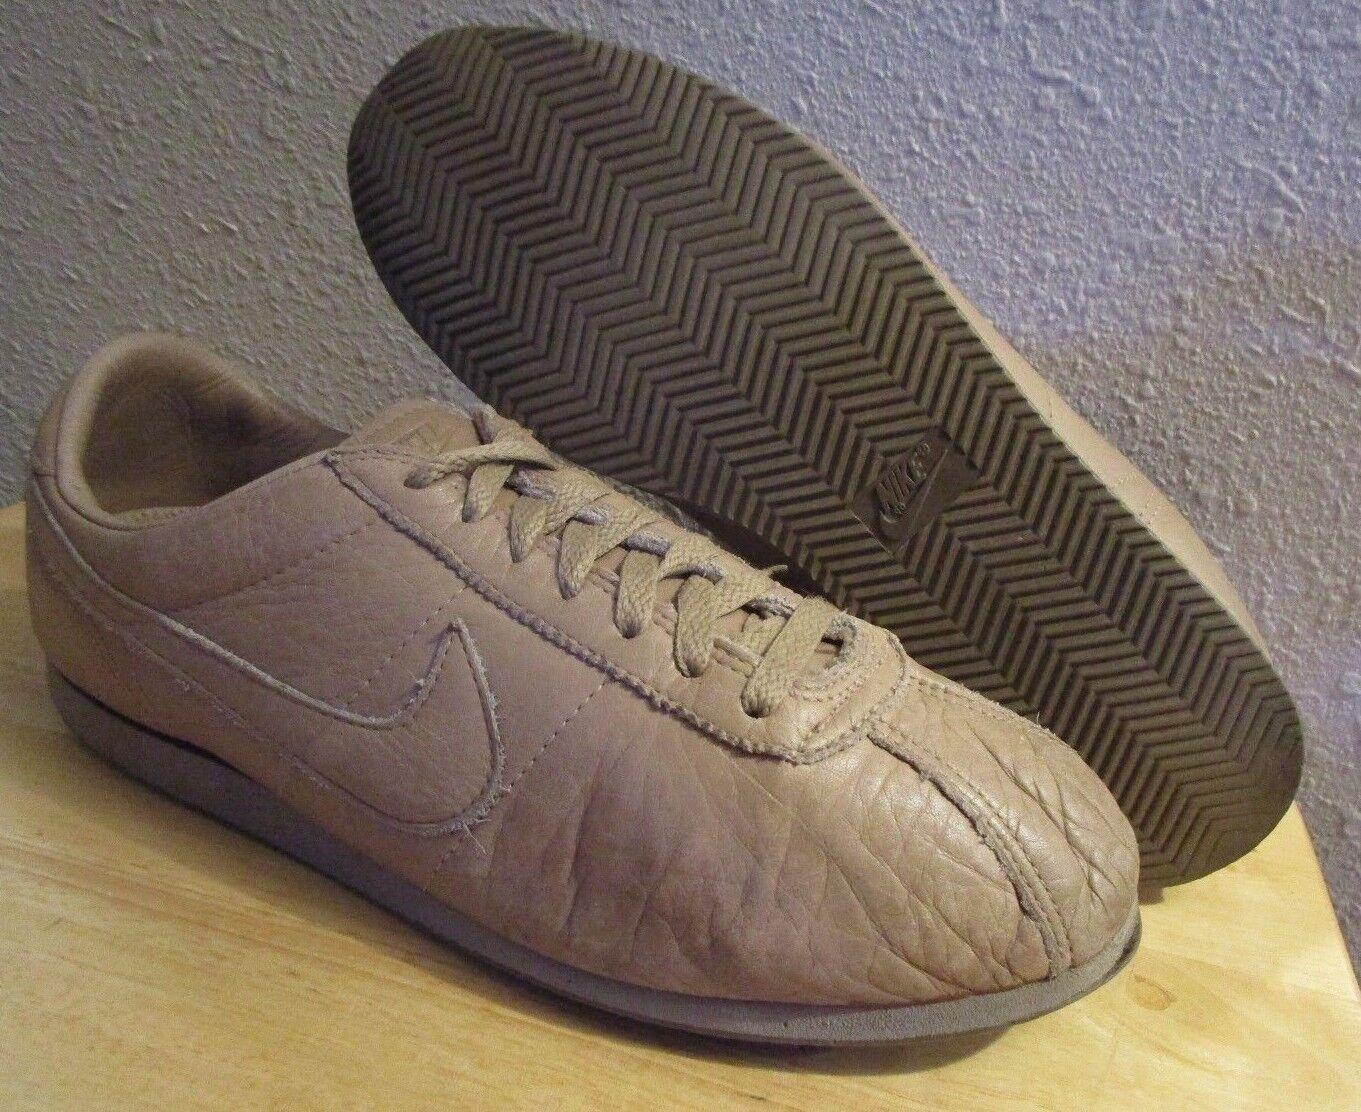 Rari si ripropone di 80 '1986 nike cortez waffle brown tan scarpe da corsa, uomo